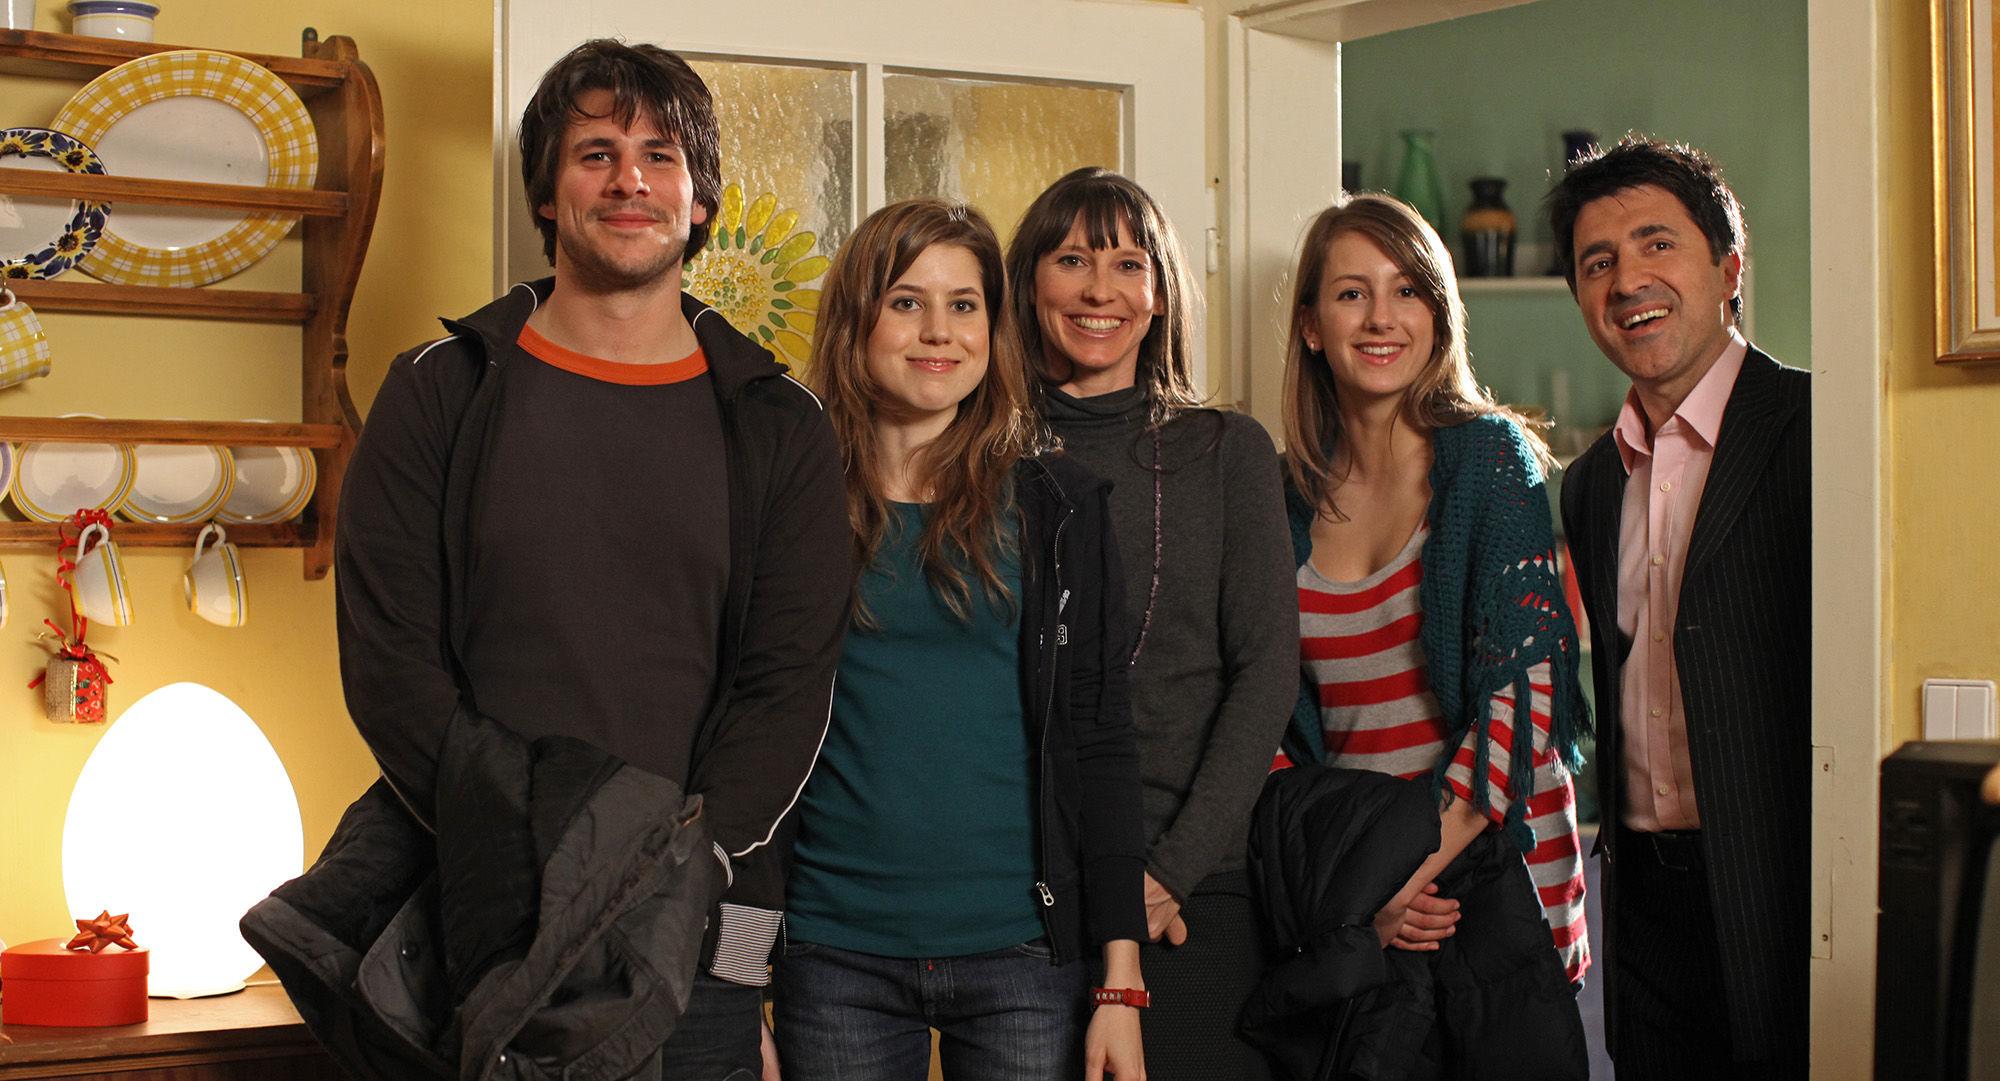 Philip Leenders (James Horrowitz), Nora Heschl (Judith Schnabel), Maria Köstlinger (Anna Schnabel), Julia Krombach (Nadine Horrowitz), Haydar Zorlu (Seyfi Ülbül)